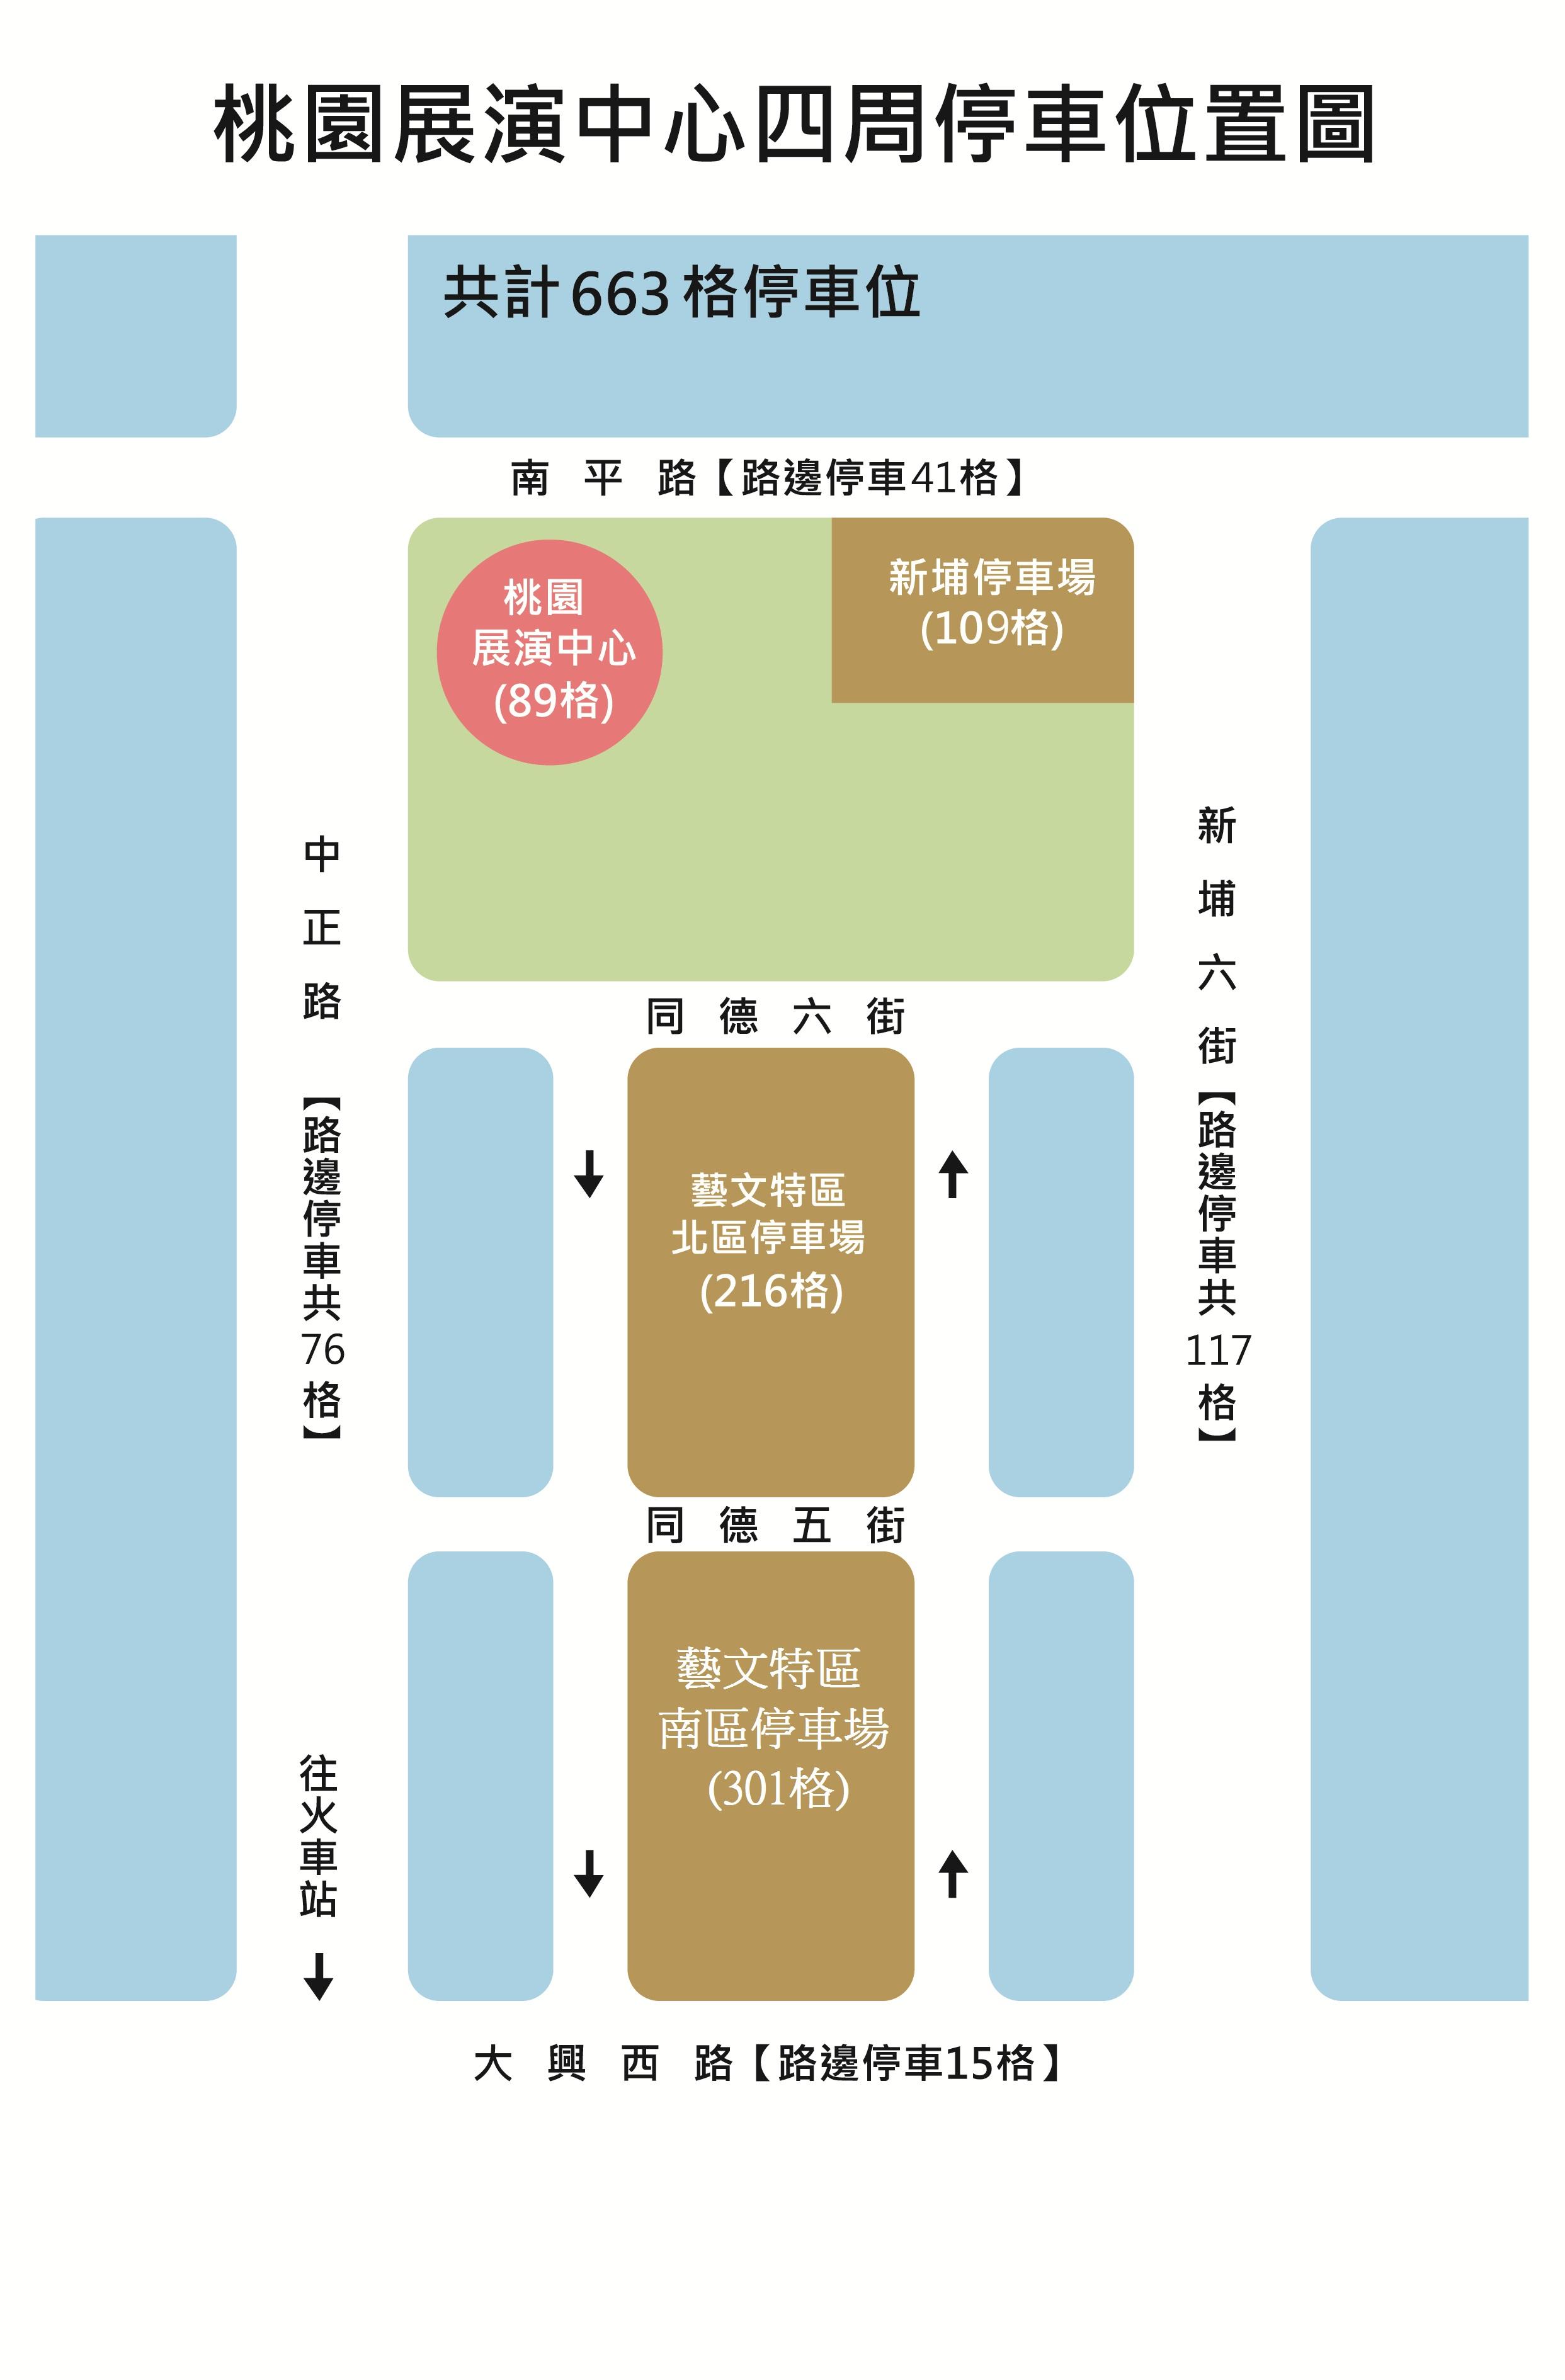 Taoyuan Parking 展演中心周邊停車格一覽表